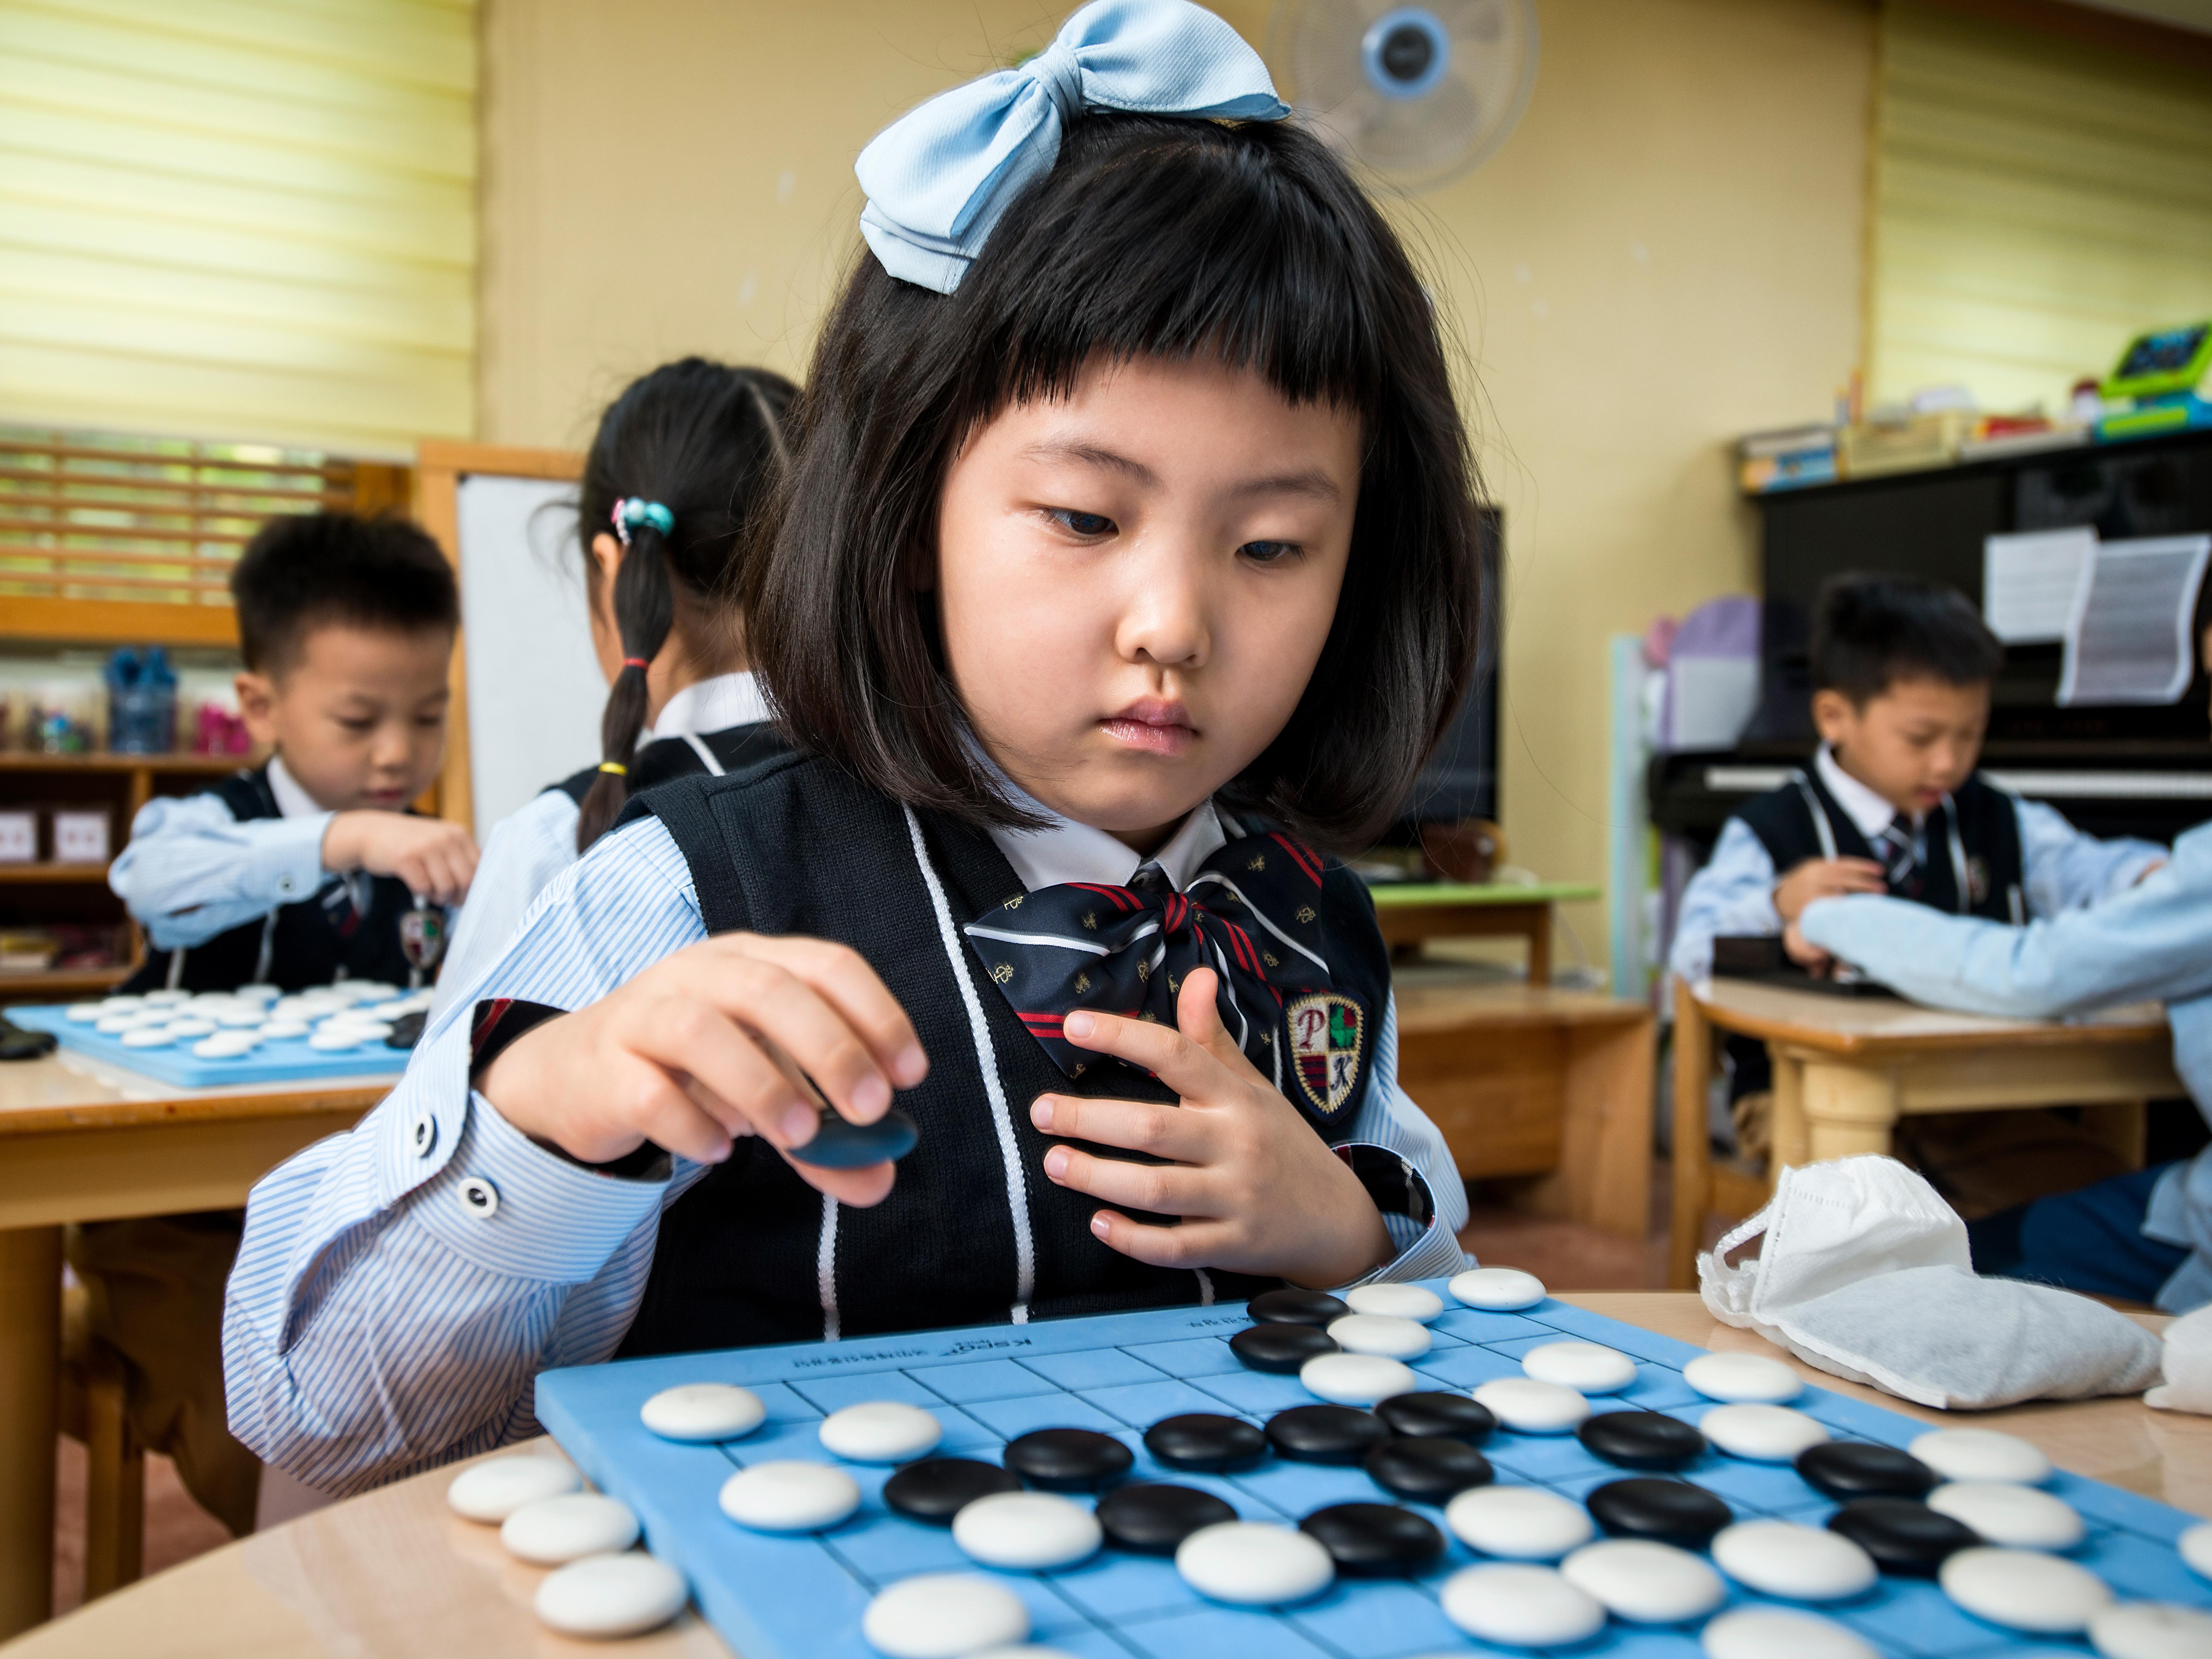 A primary school student